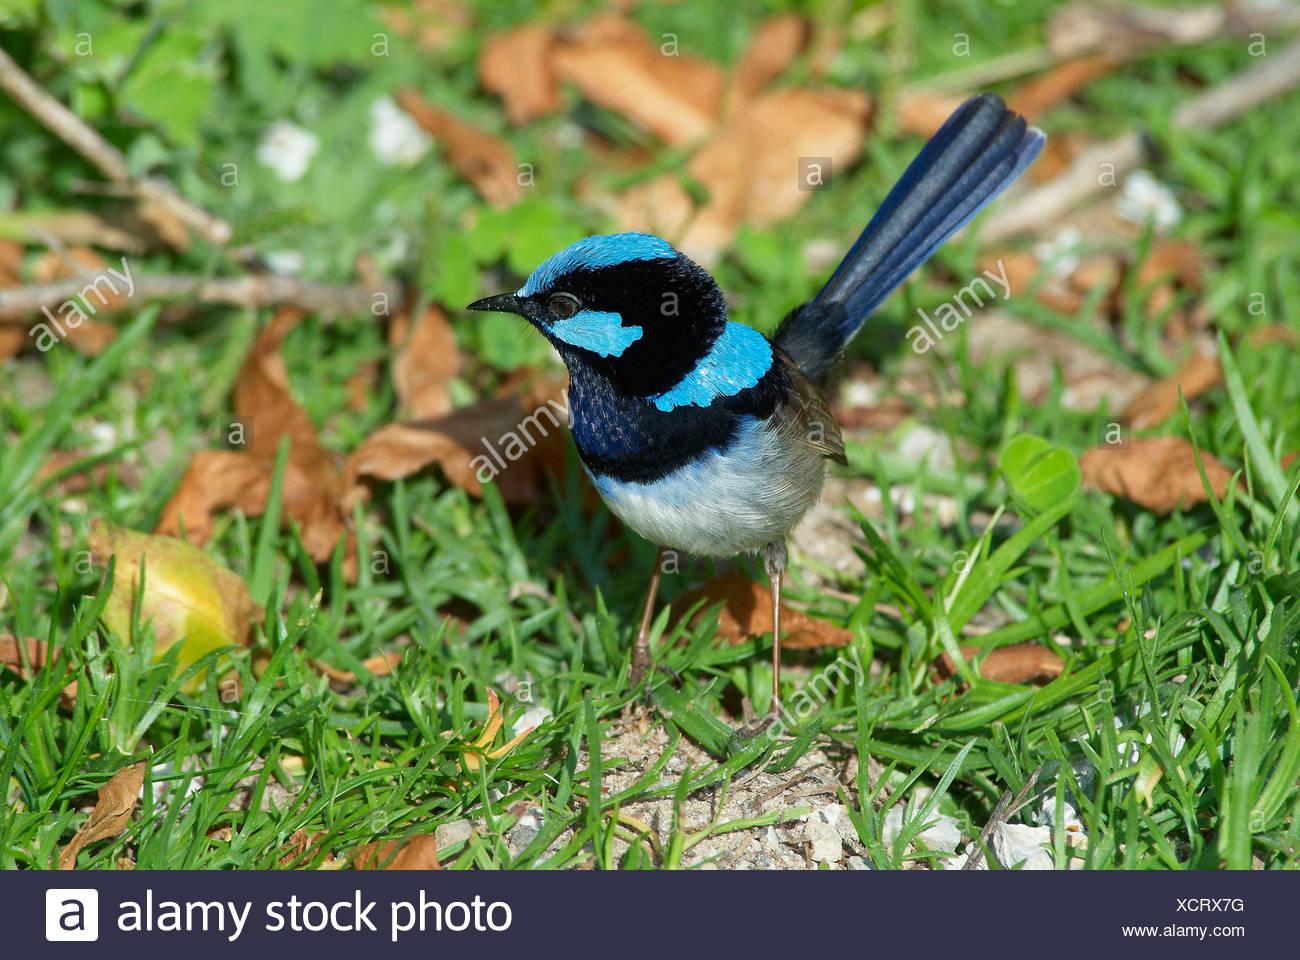 Australia, Fairy Wren, animale, Victoria, uccelli, Wilsons Promontory, parco nazionale, Physignathus Lesuerii, superba fata wren, Immagini Stock